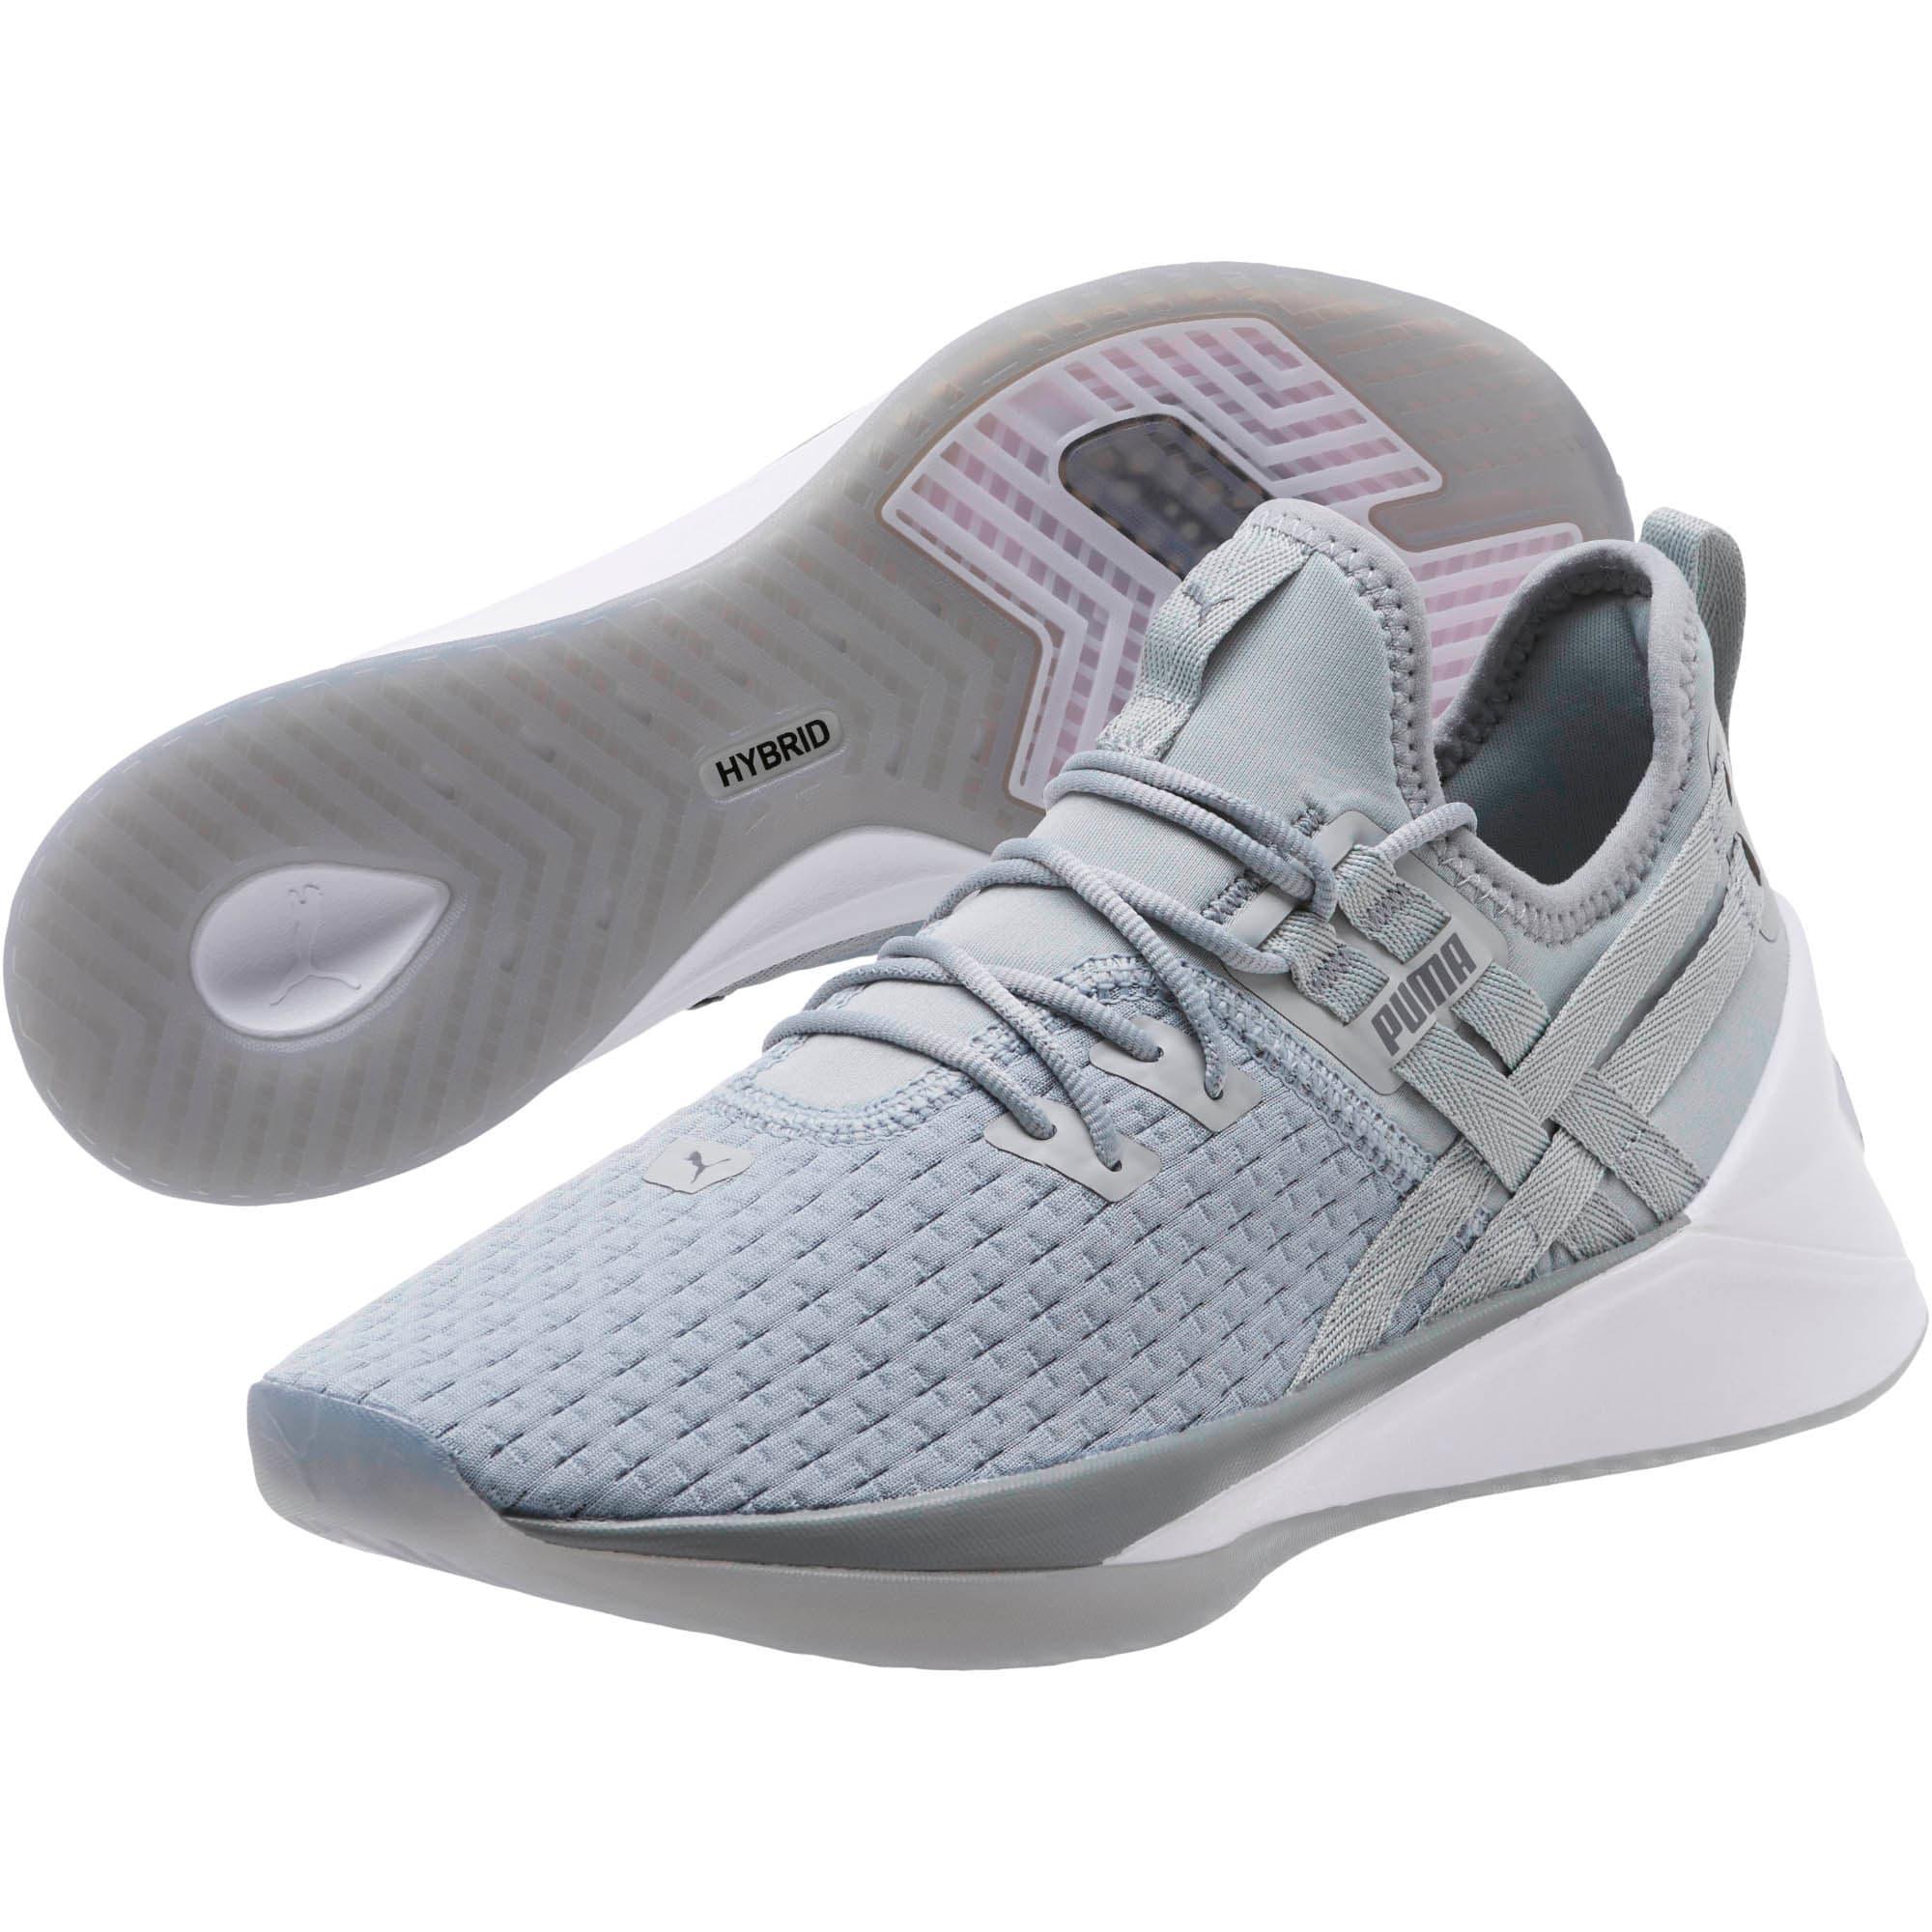 Thumbnail 2 of Jaab XT Women's Training Shoes, Quarry-Puma White, medium